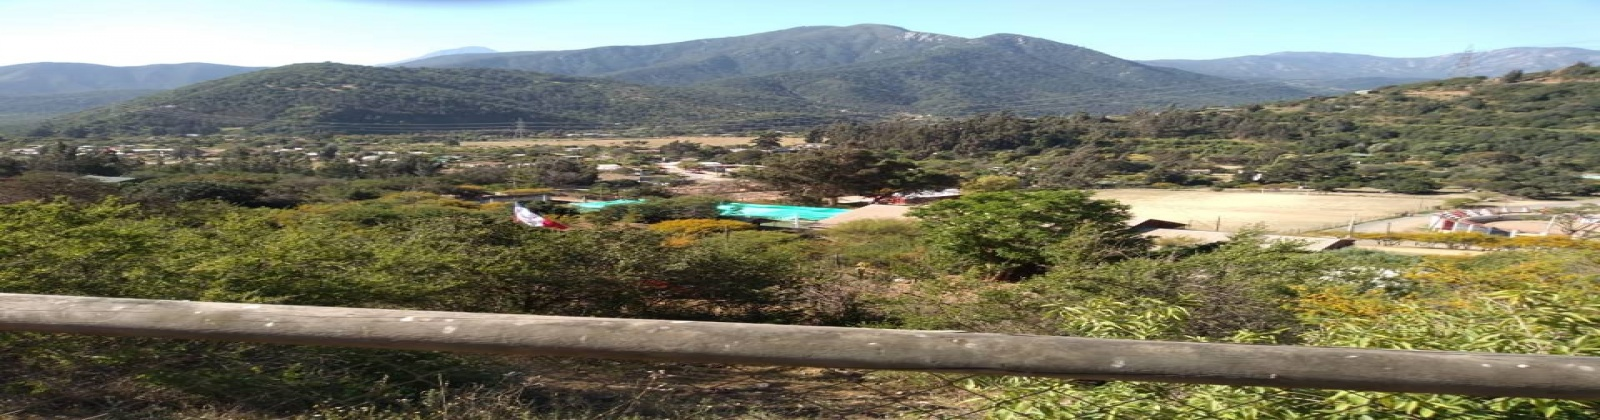 s/n Campo de deporte, Olmué, Región V - Valparaiso, ,Terreno,Venta,Campo de deporte,1021